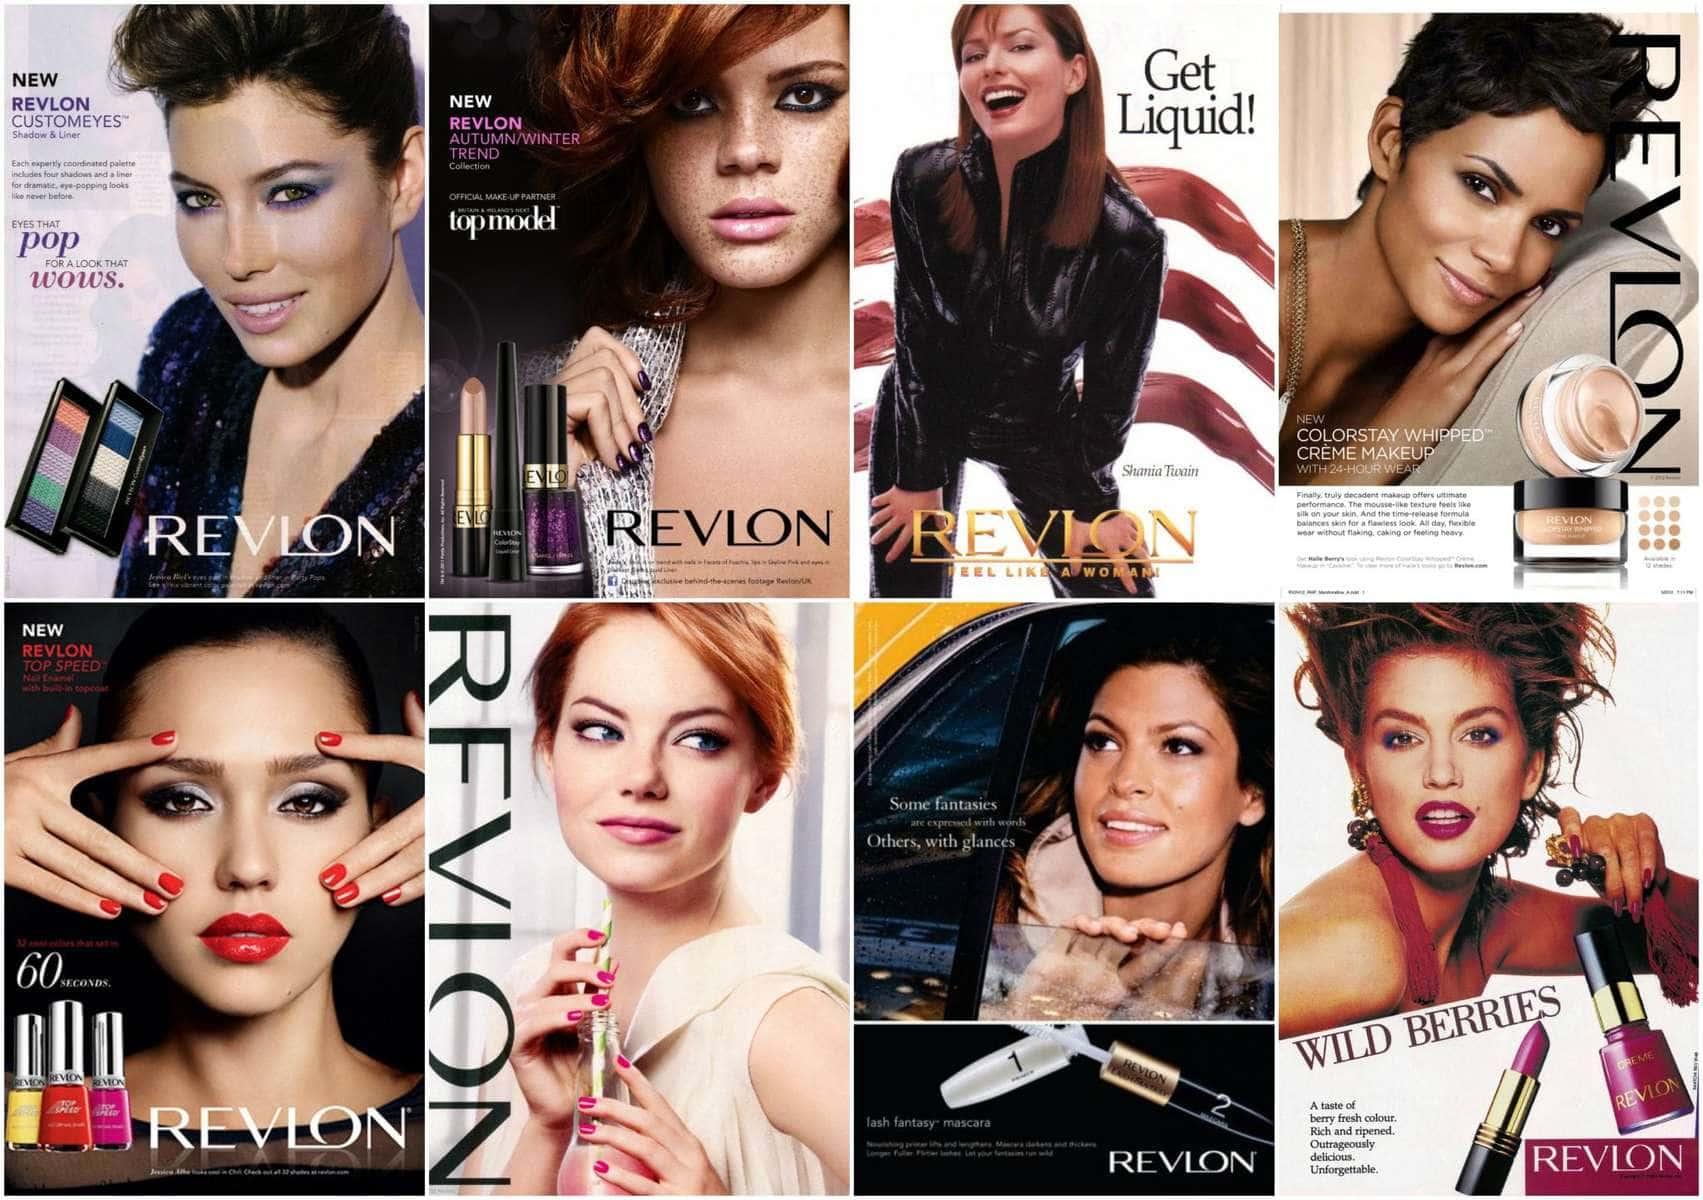 revlon magazine ads over the years